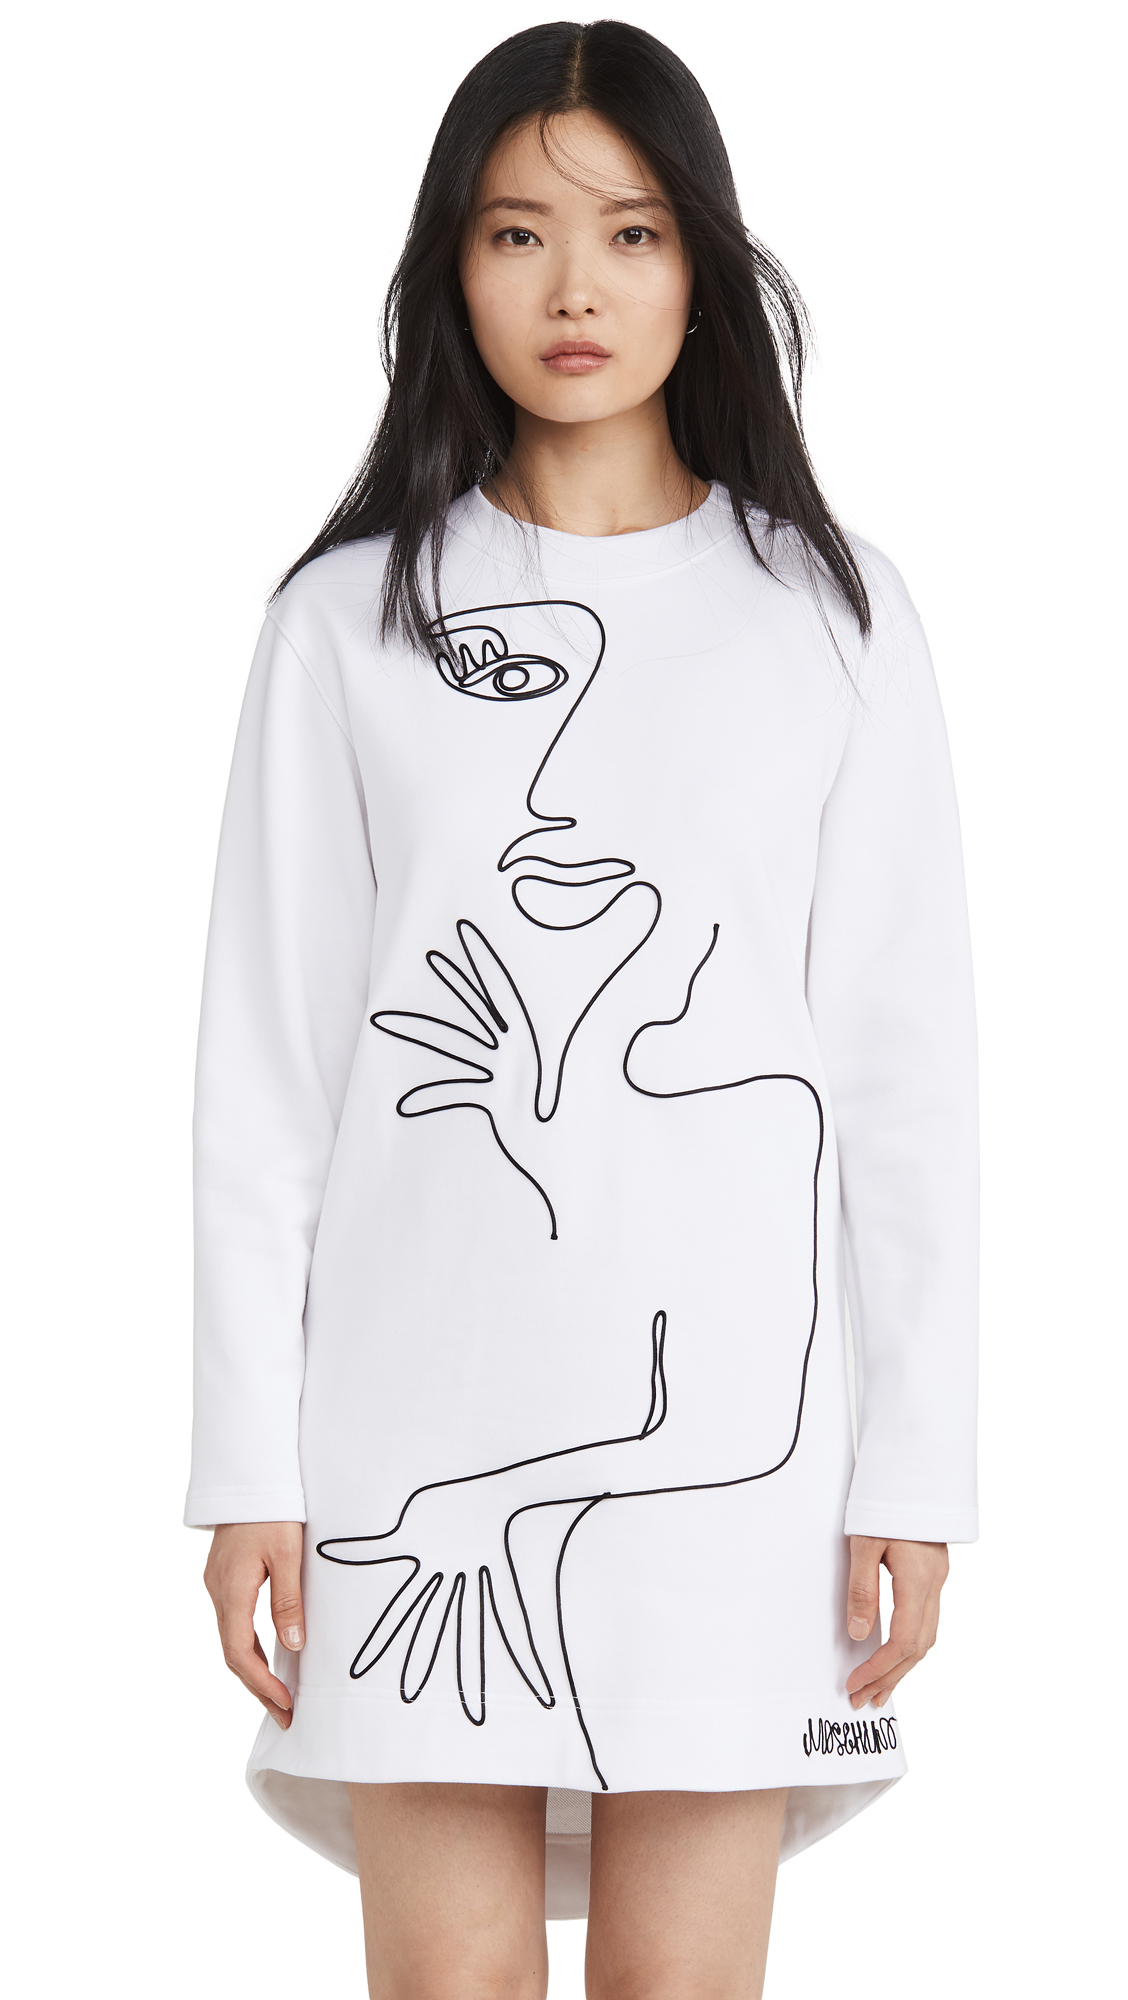 Moschino Long Sleeve Artwork Dress - 40% Off Sale